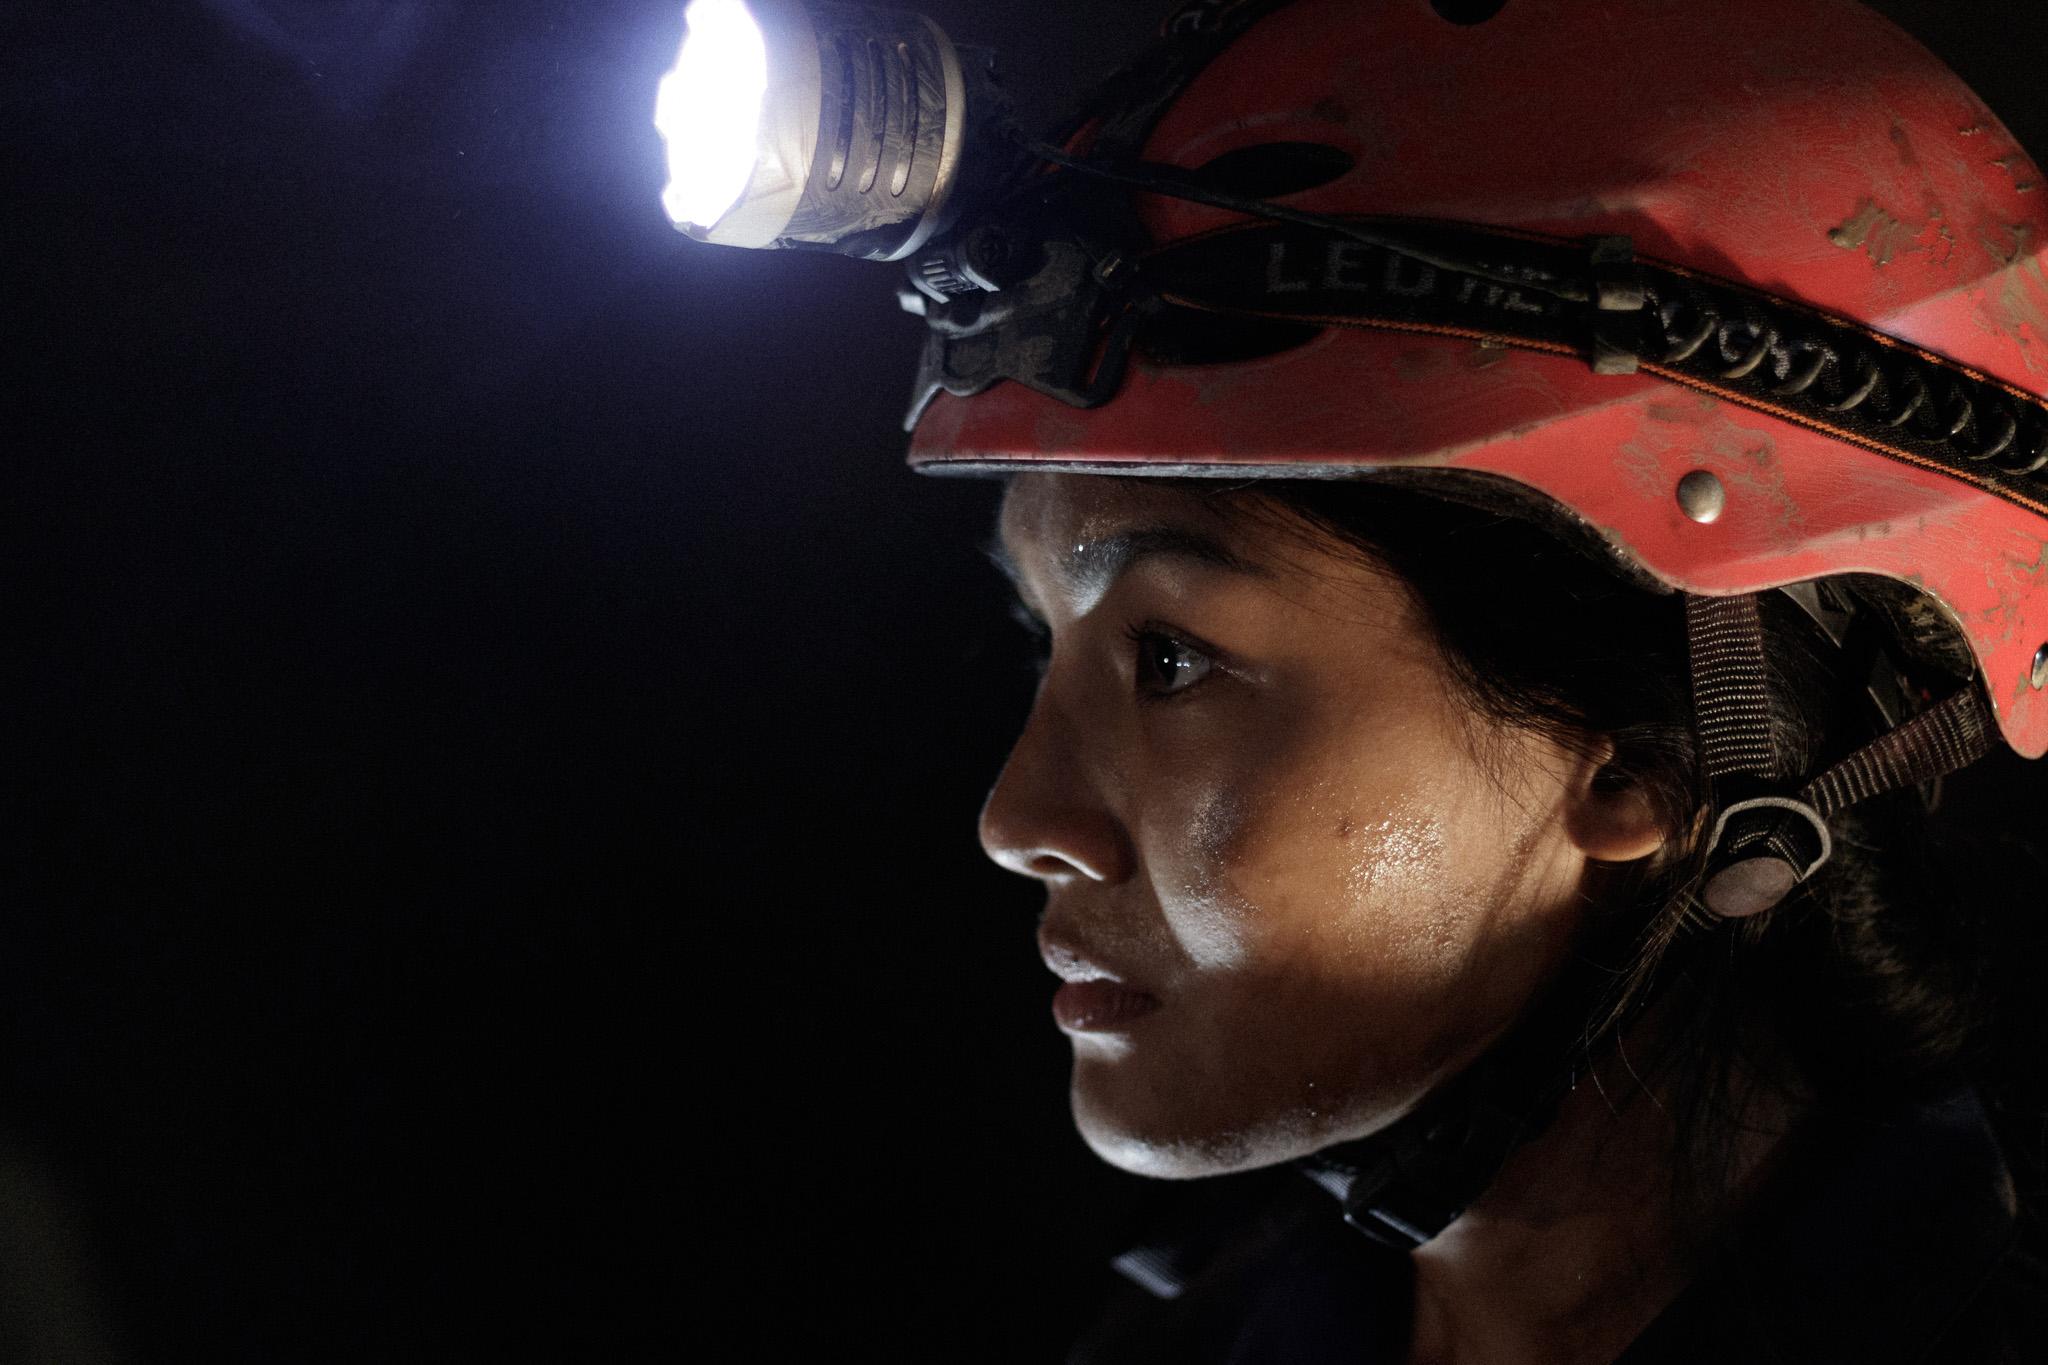 The_Cave-นางนอน-Rescuer_2048px.jpg